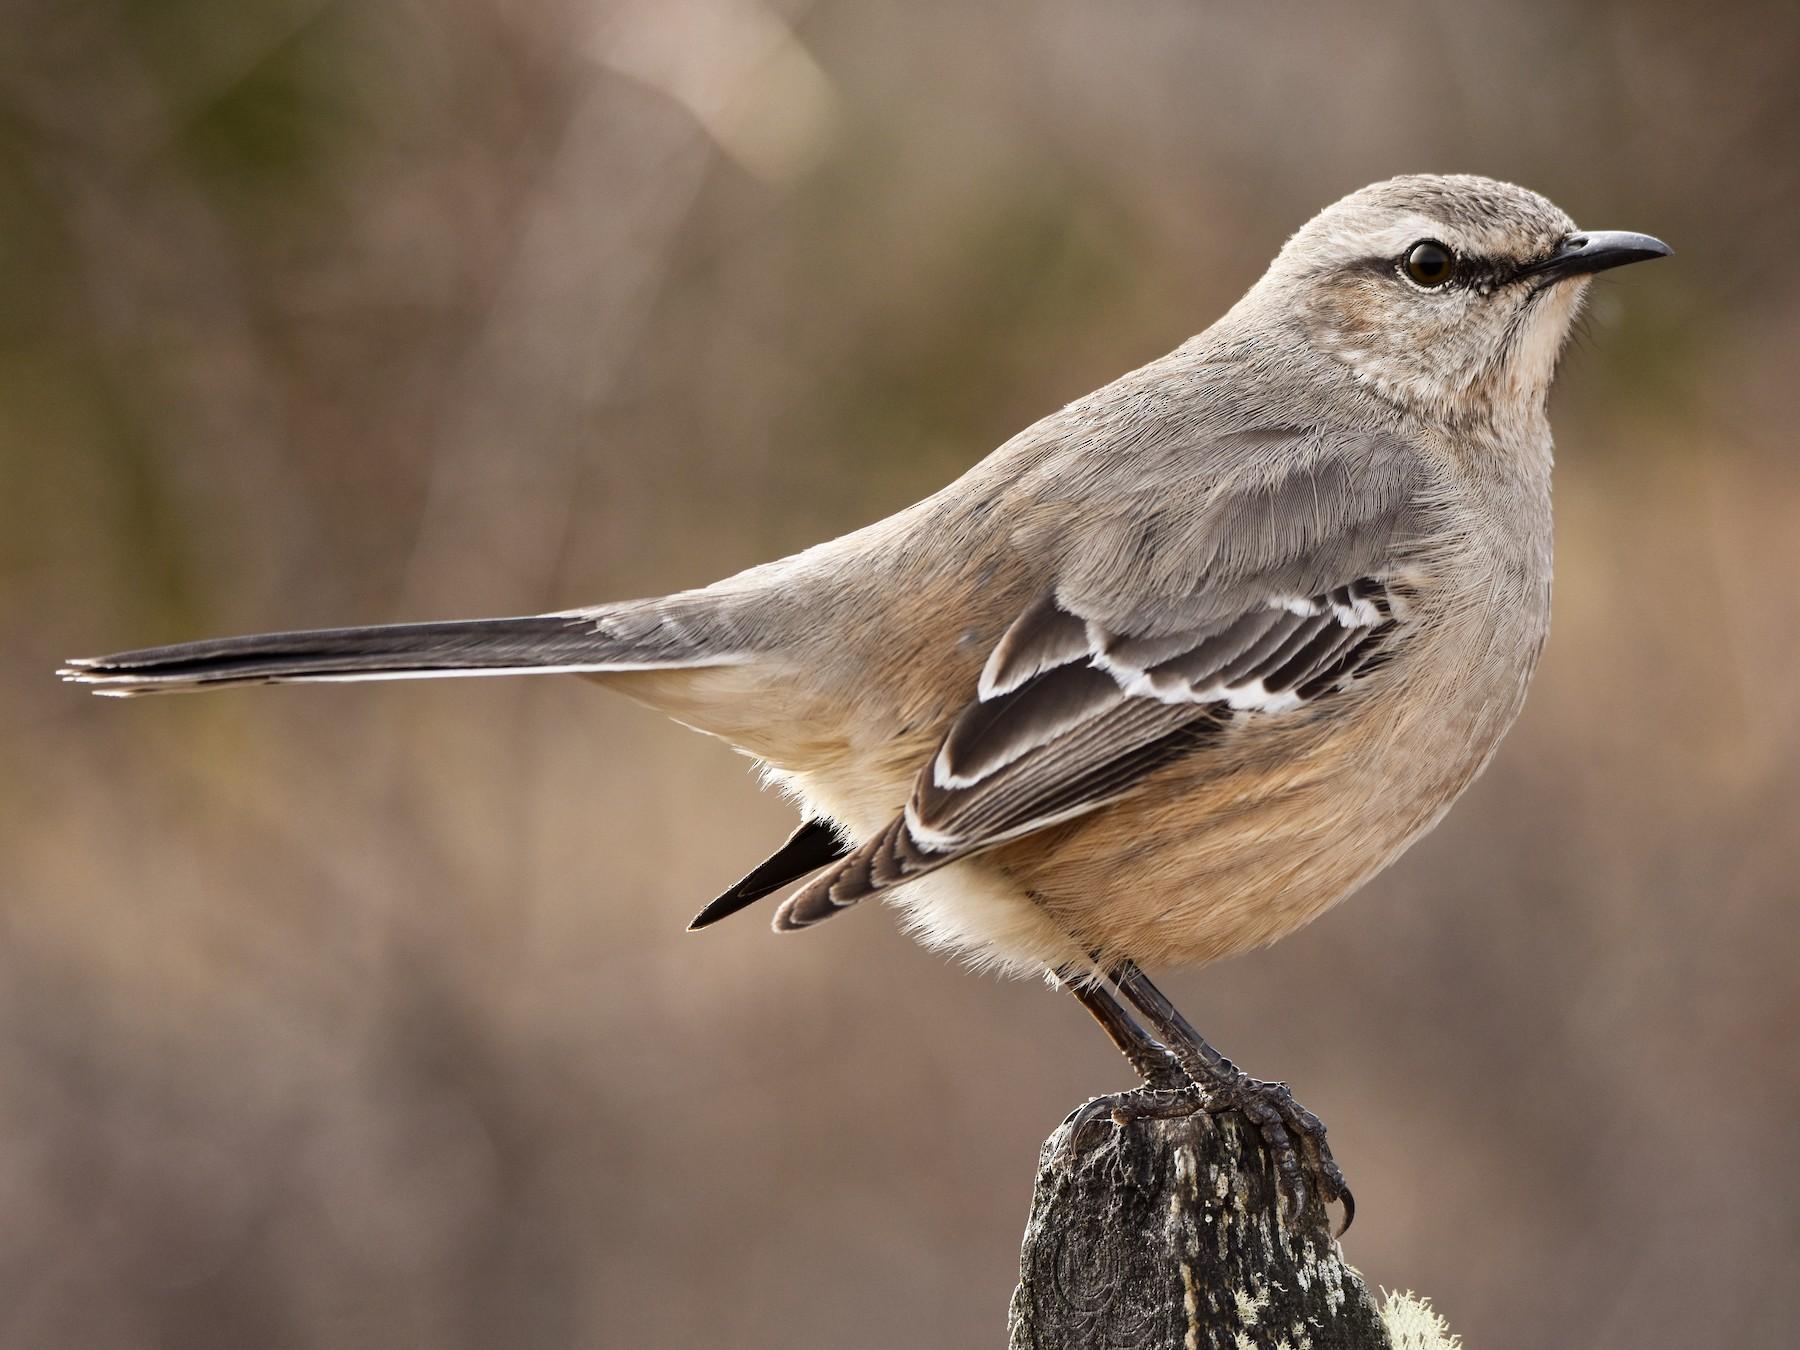 Patagonian Mockingbird - Hederd Torres García